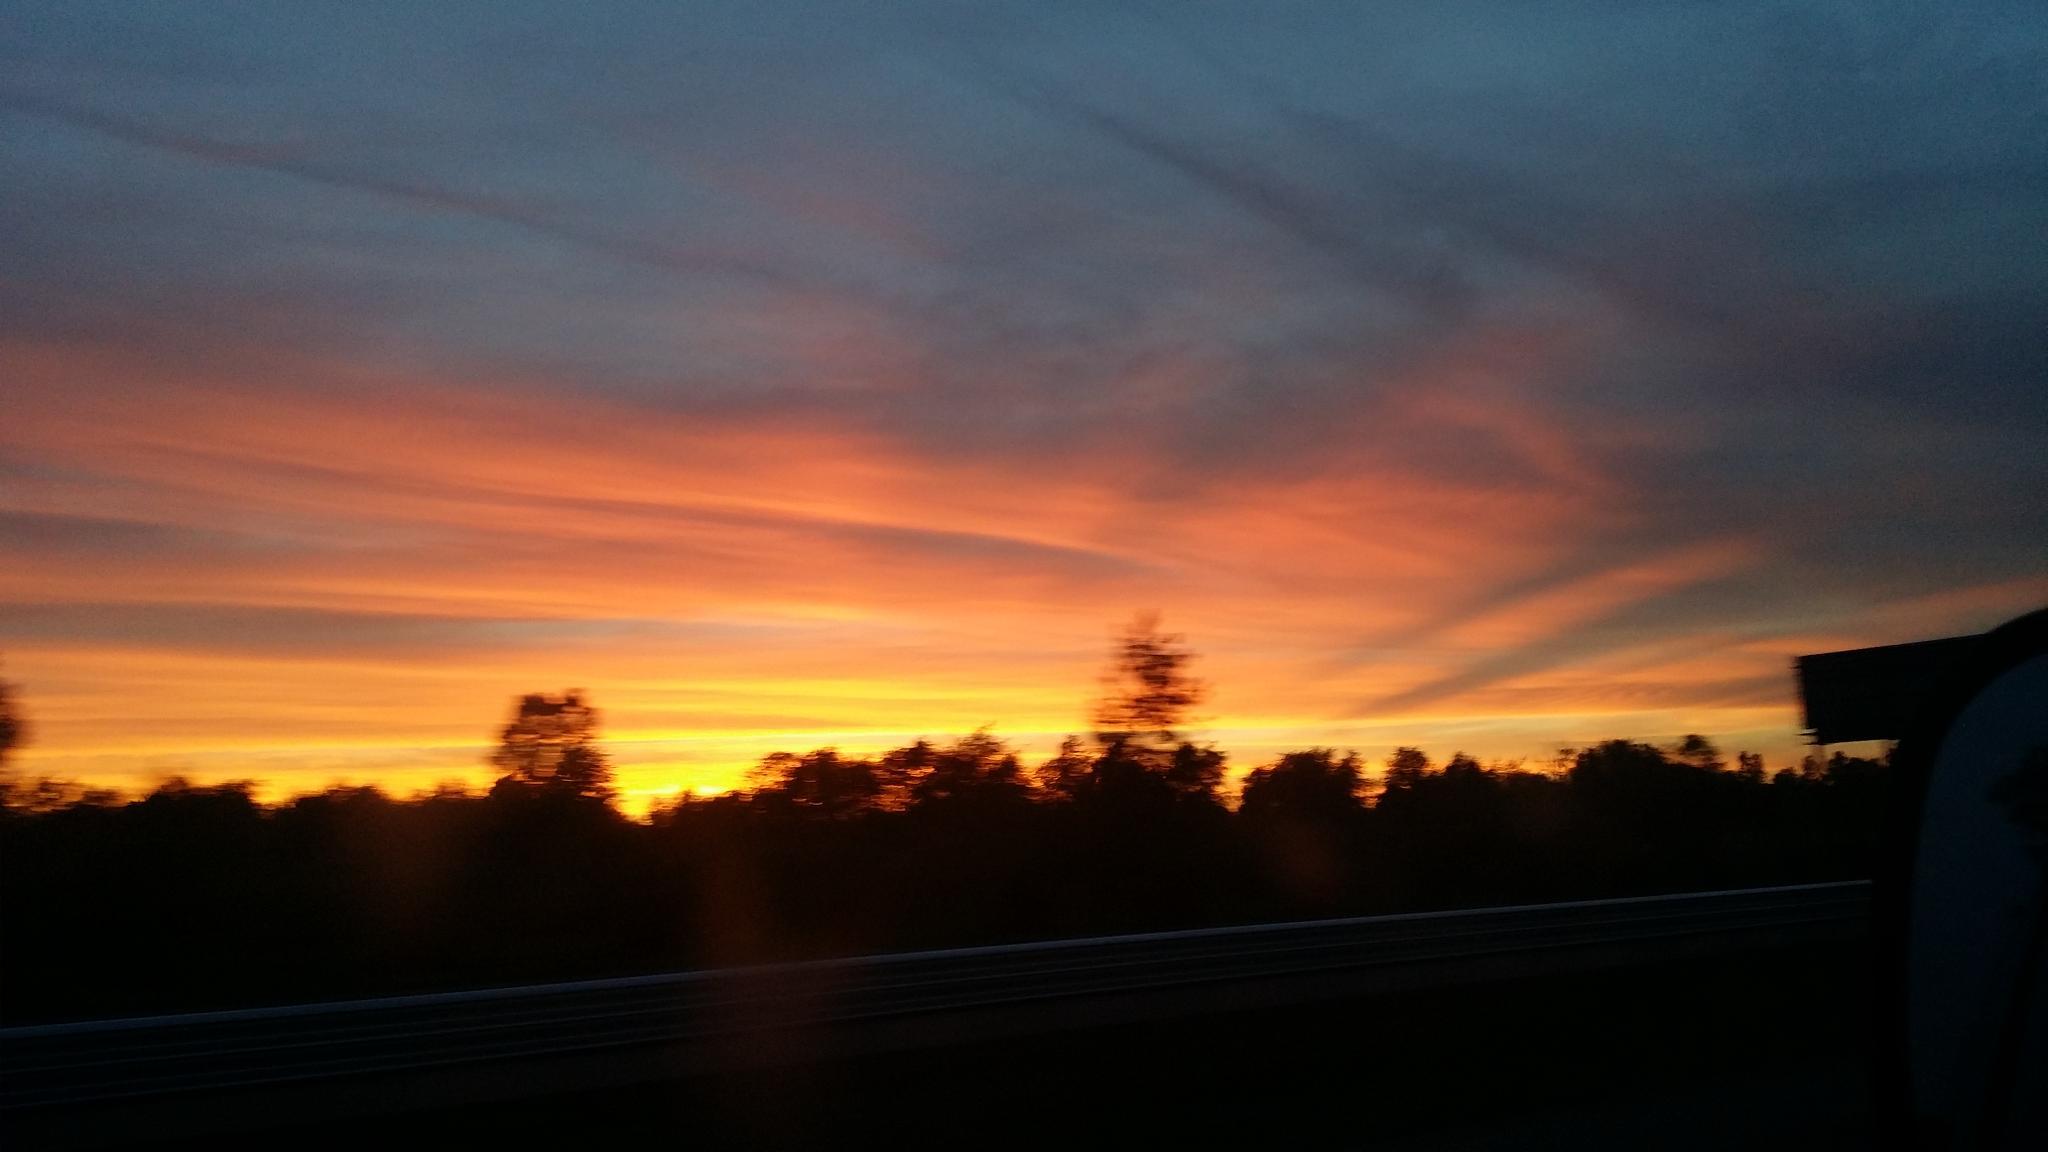 Sunset over Portage by Riddler1